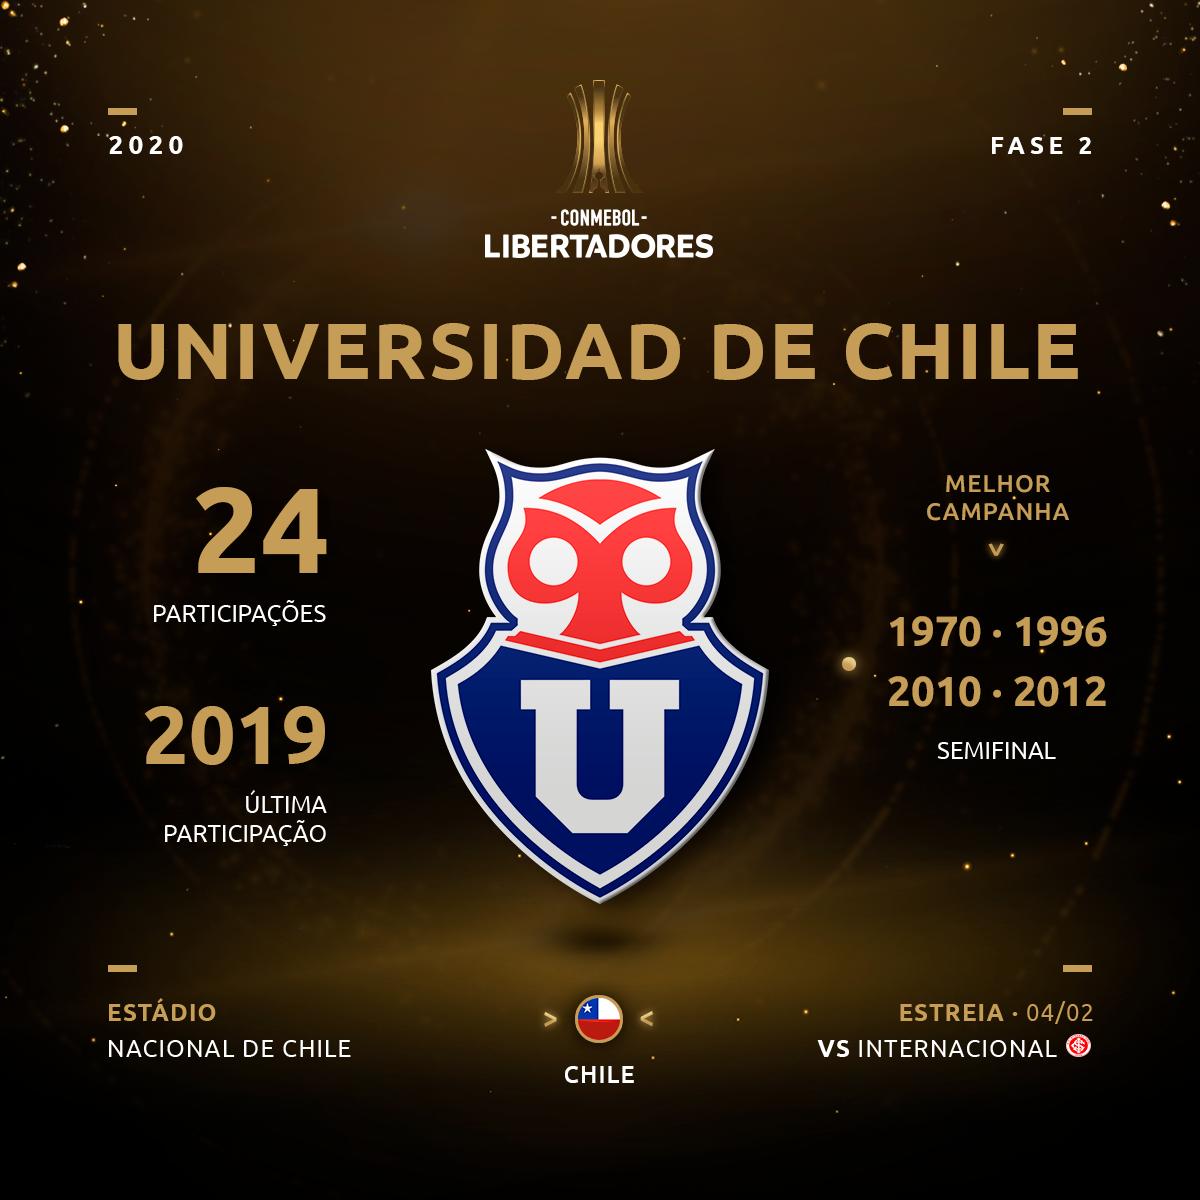 Universidad de Chile - Libertadores 2020